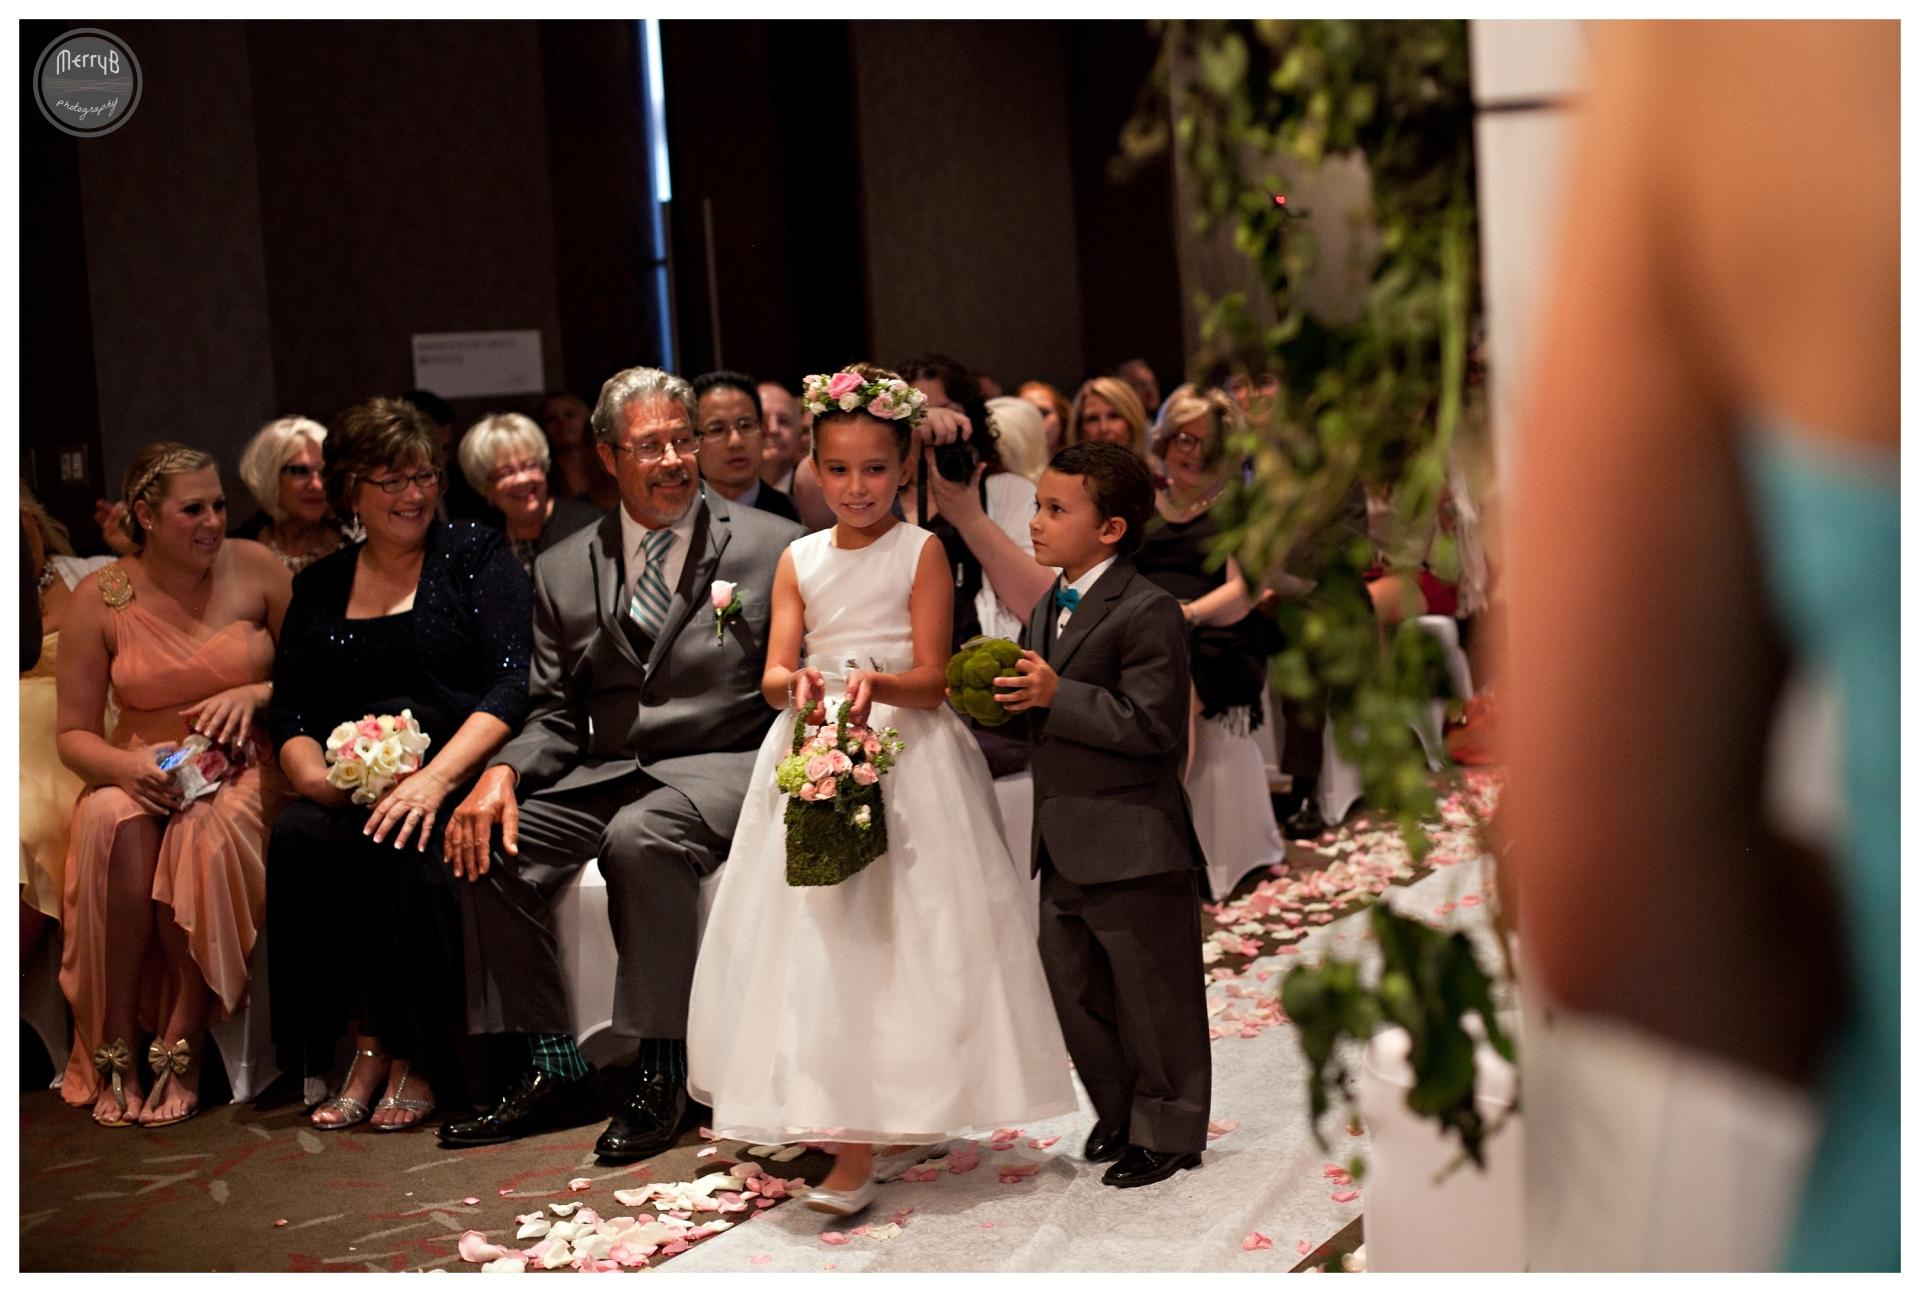 mal+jesse wedding0057